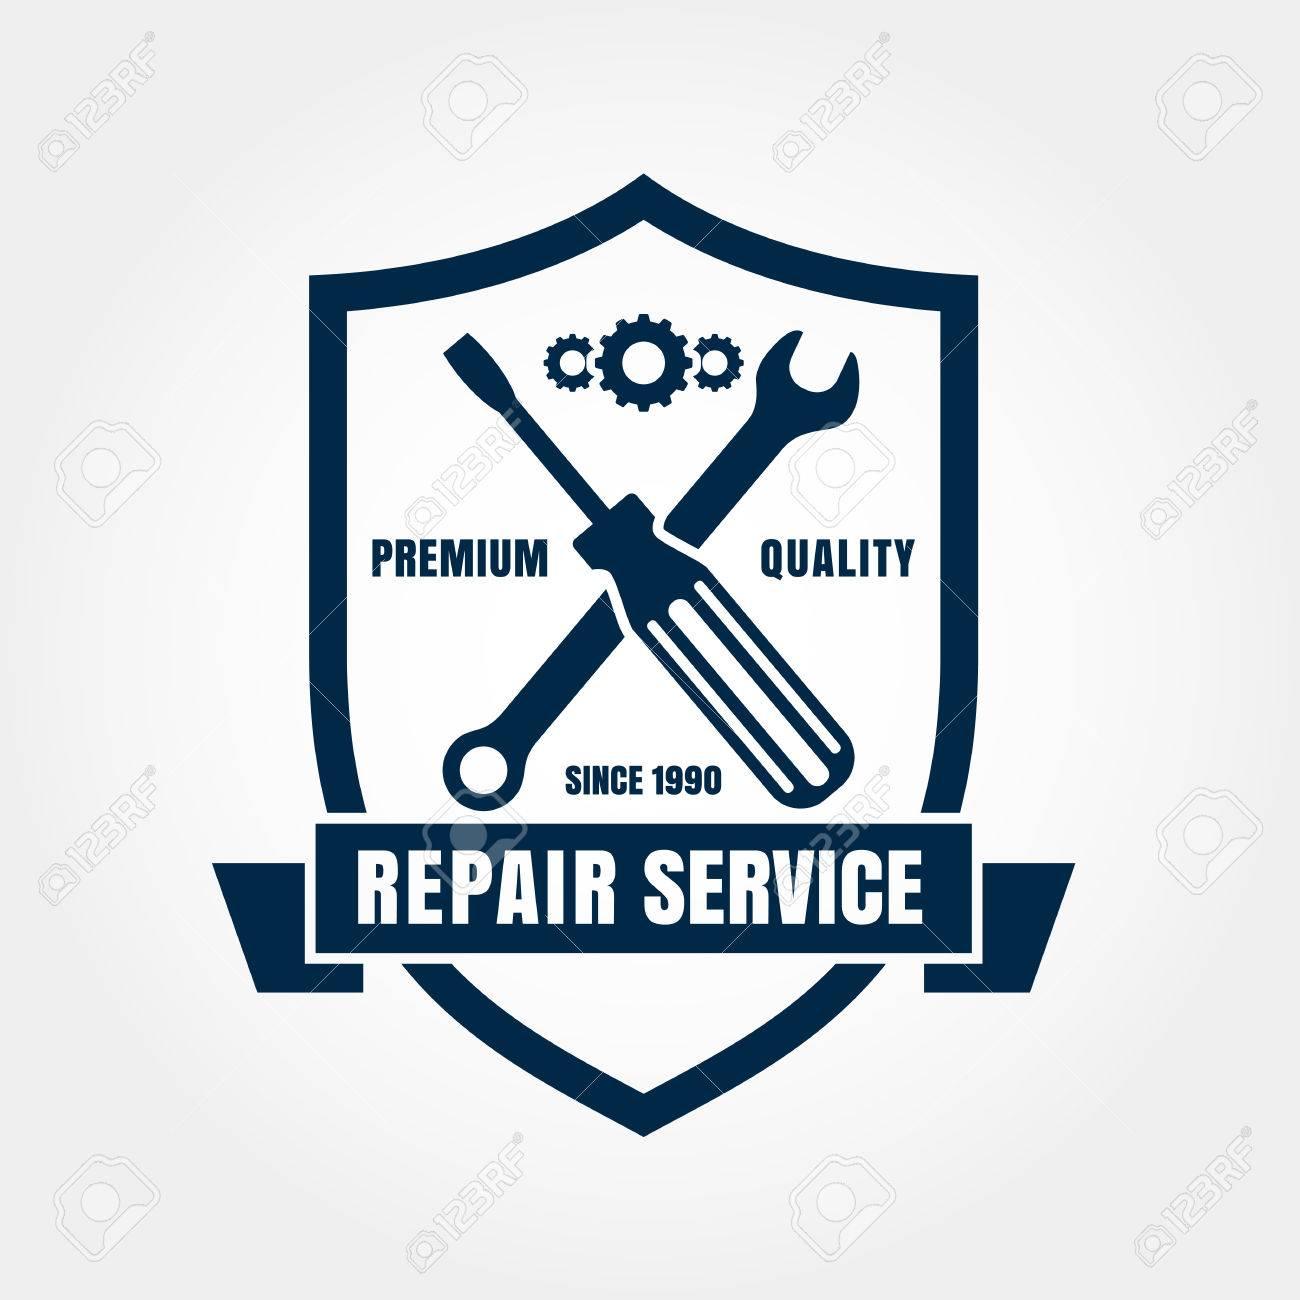 Design car emblem - Vector Vintage Style Car Repair Service Shield Label Vector Logo Design Template